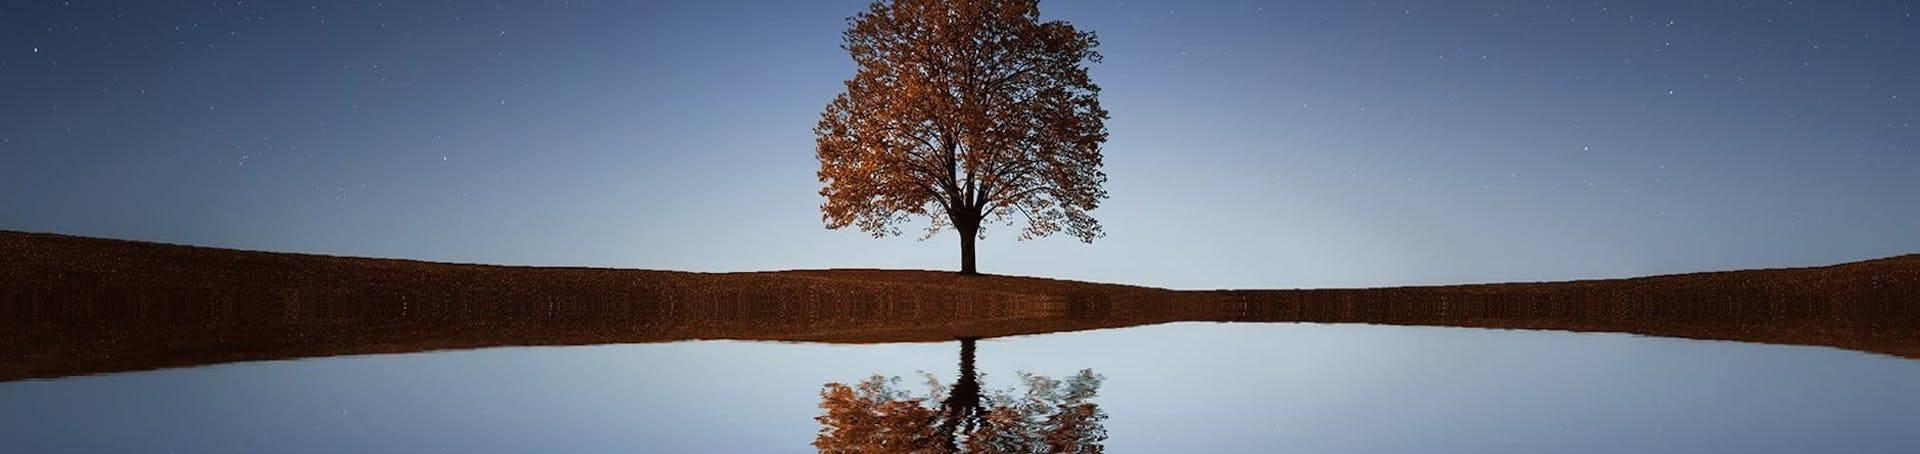 Reflection Principle